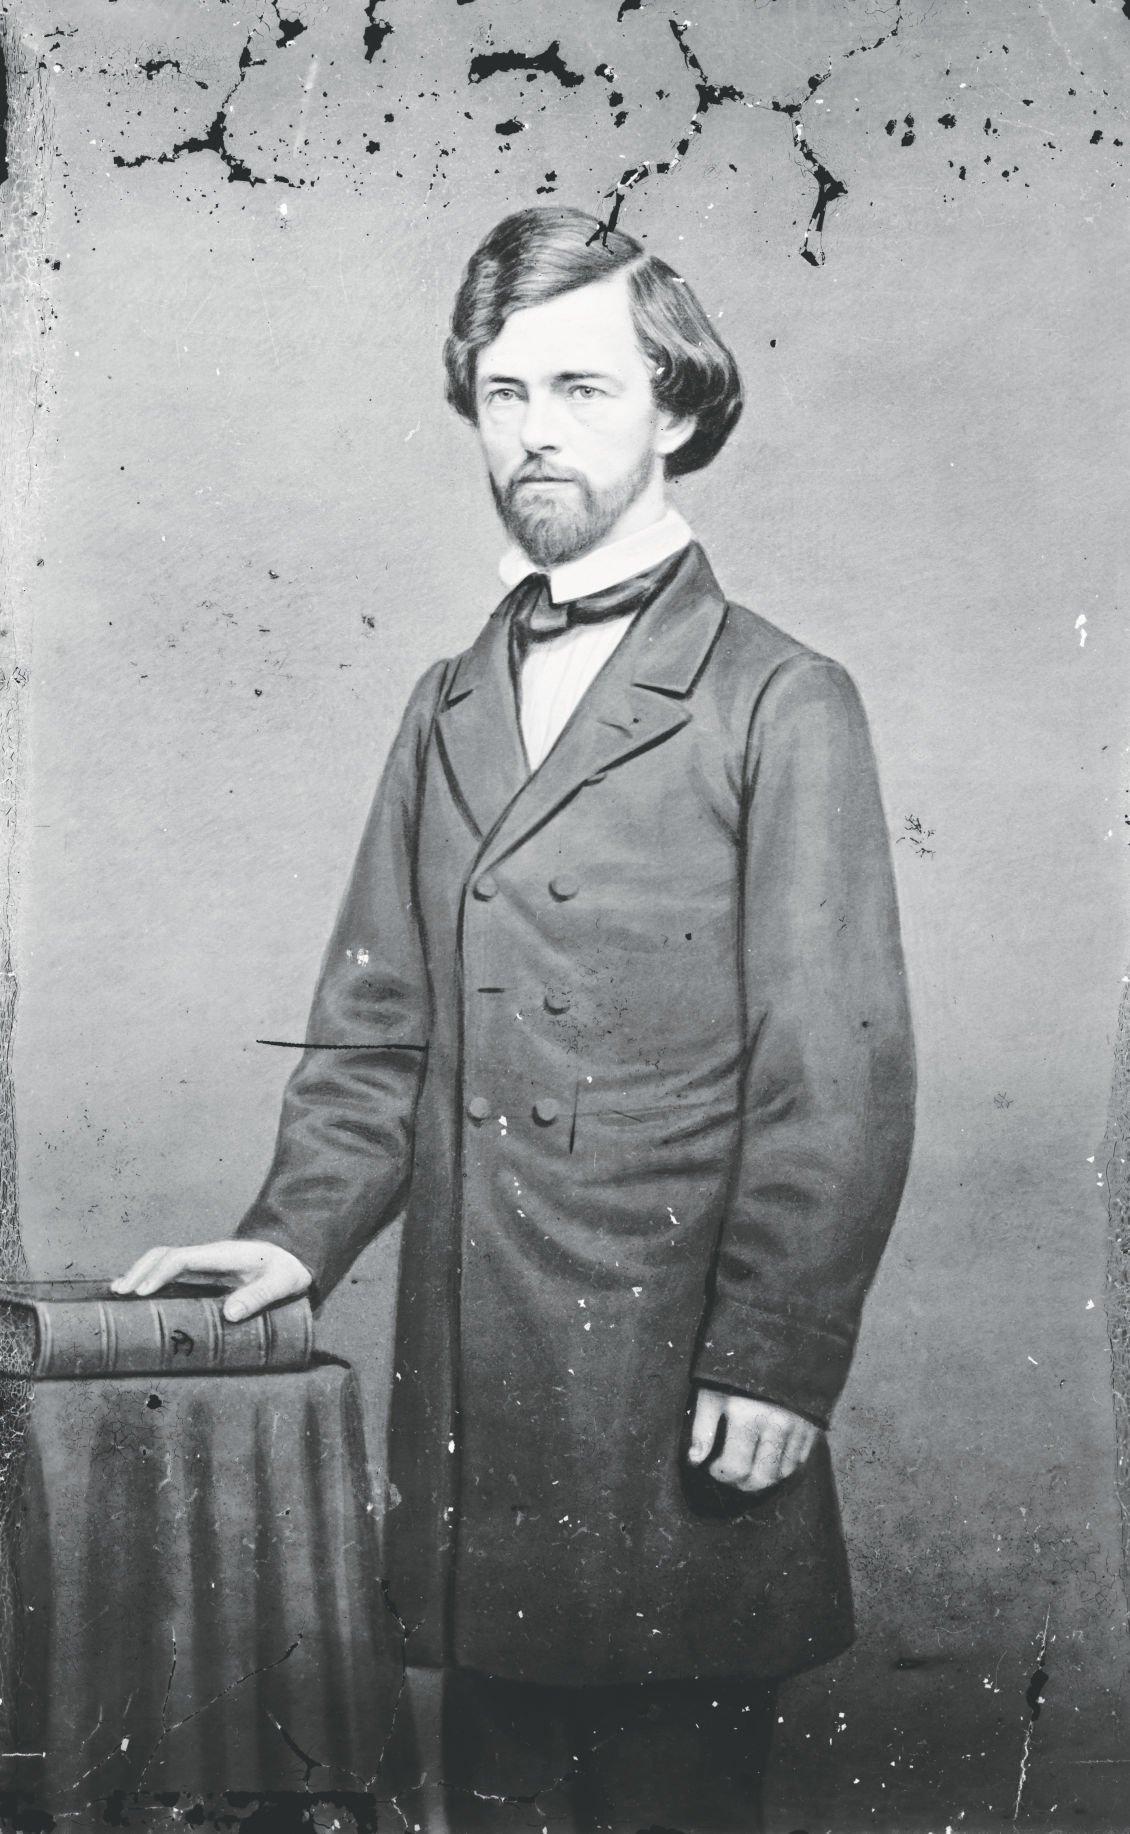 Isaac J. Stevens